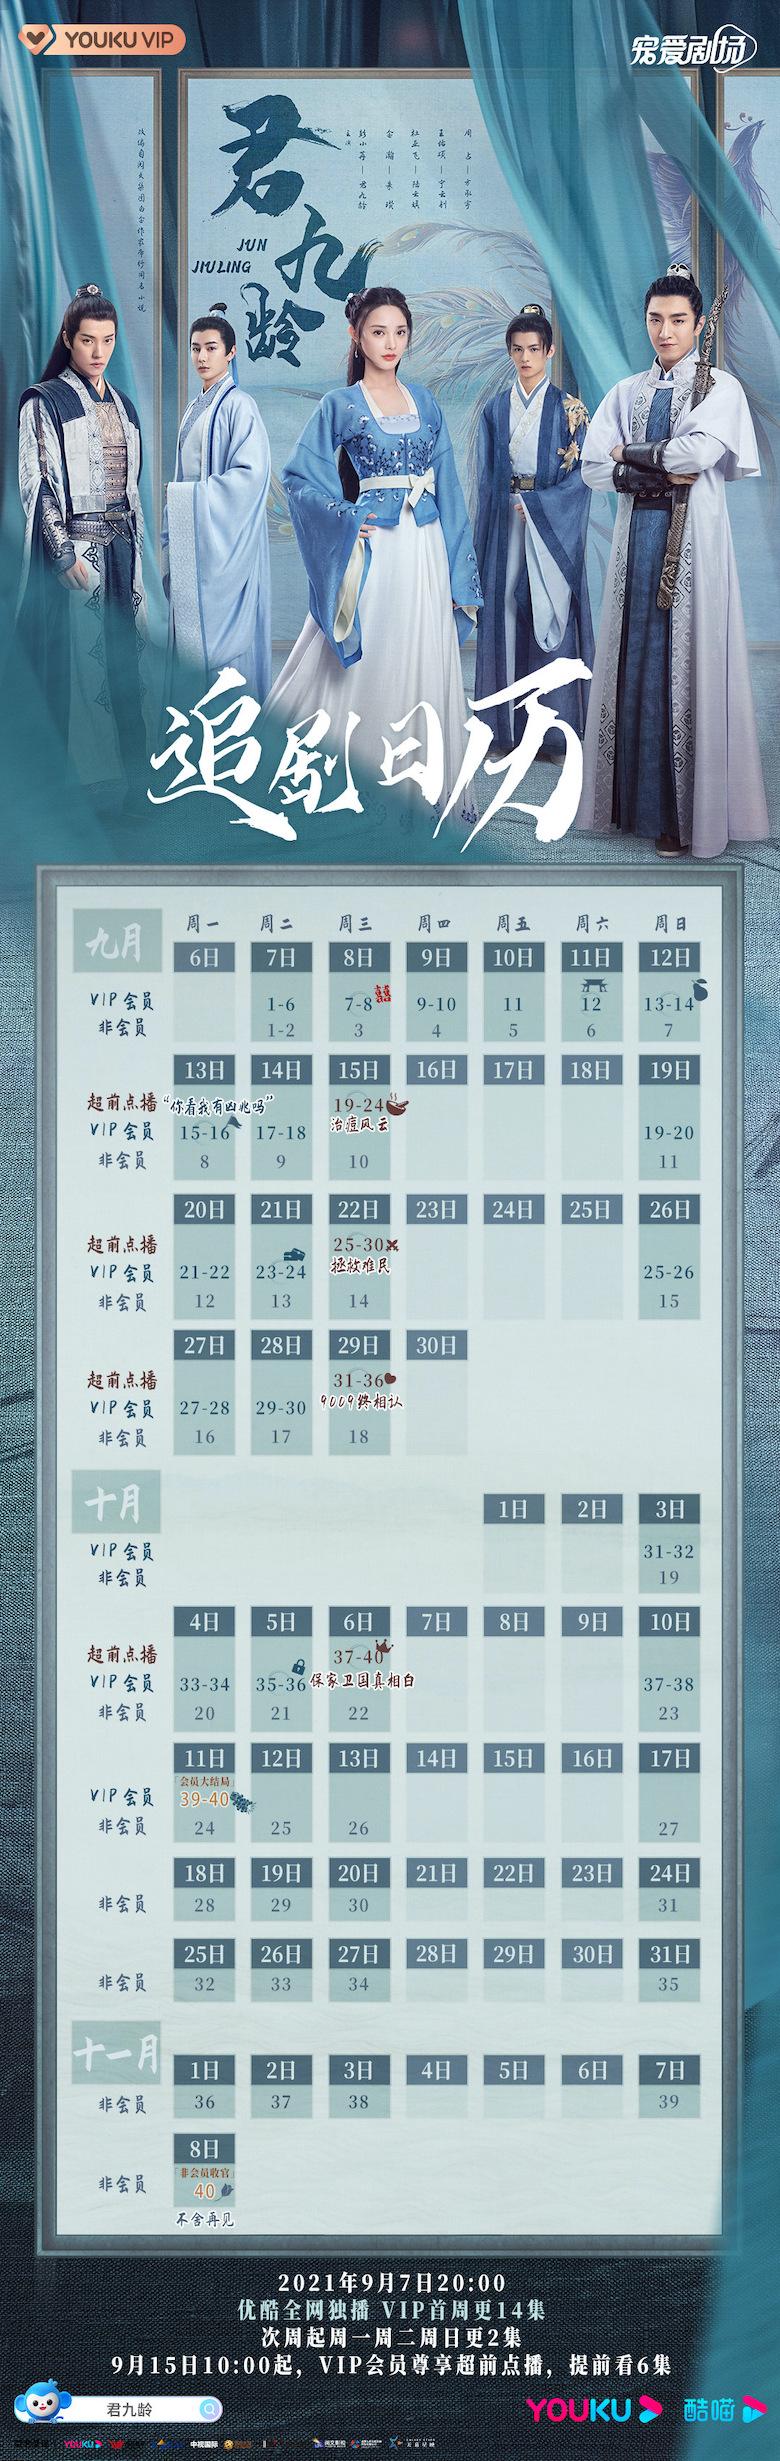 Jun Jiu Ling Chinese Drama Airing Calendar